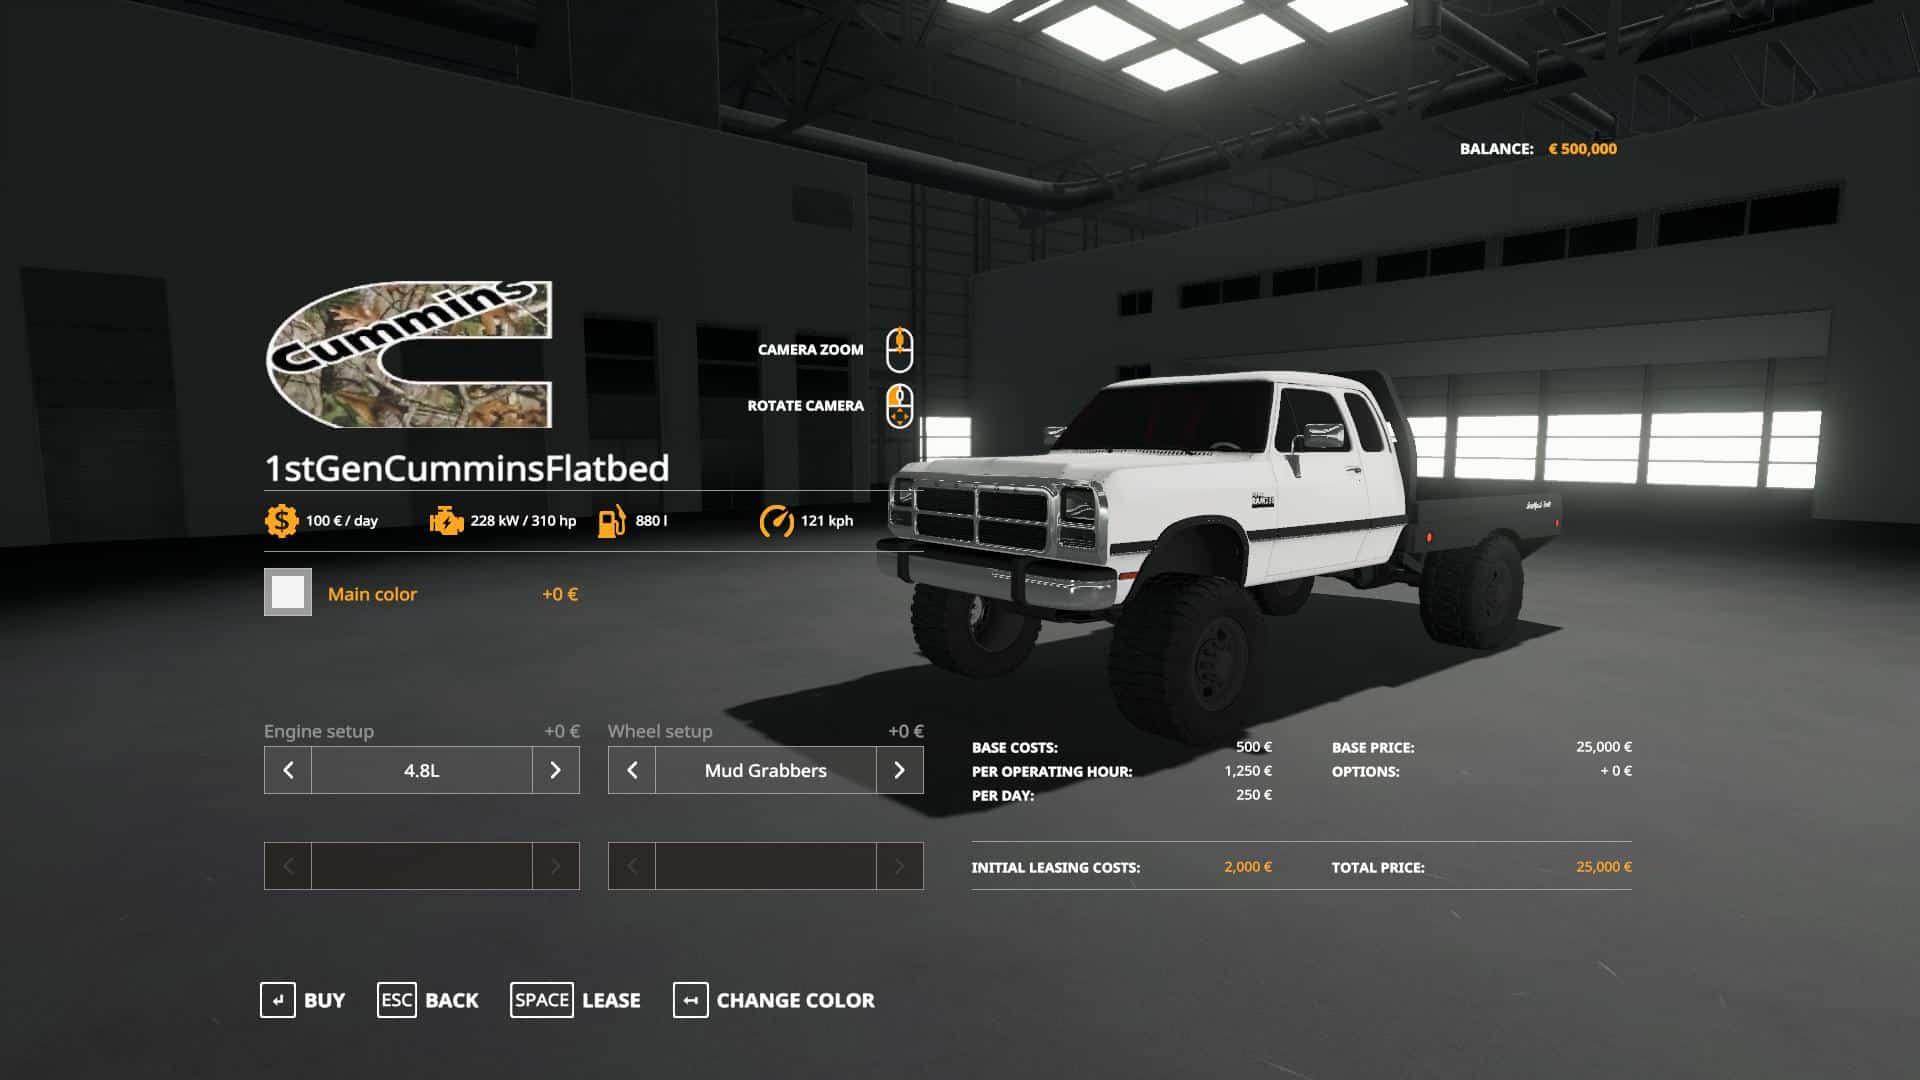 Fs19 1st Gen Cummins Flatbed V2 0 Farming Simulator 19 17 15 Mod